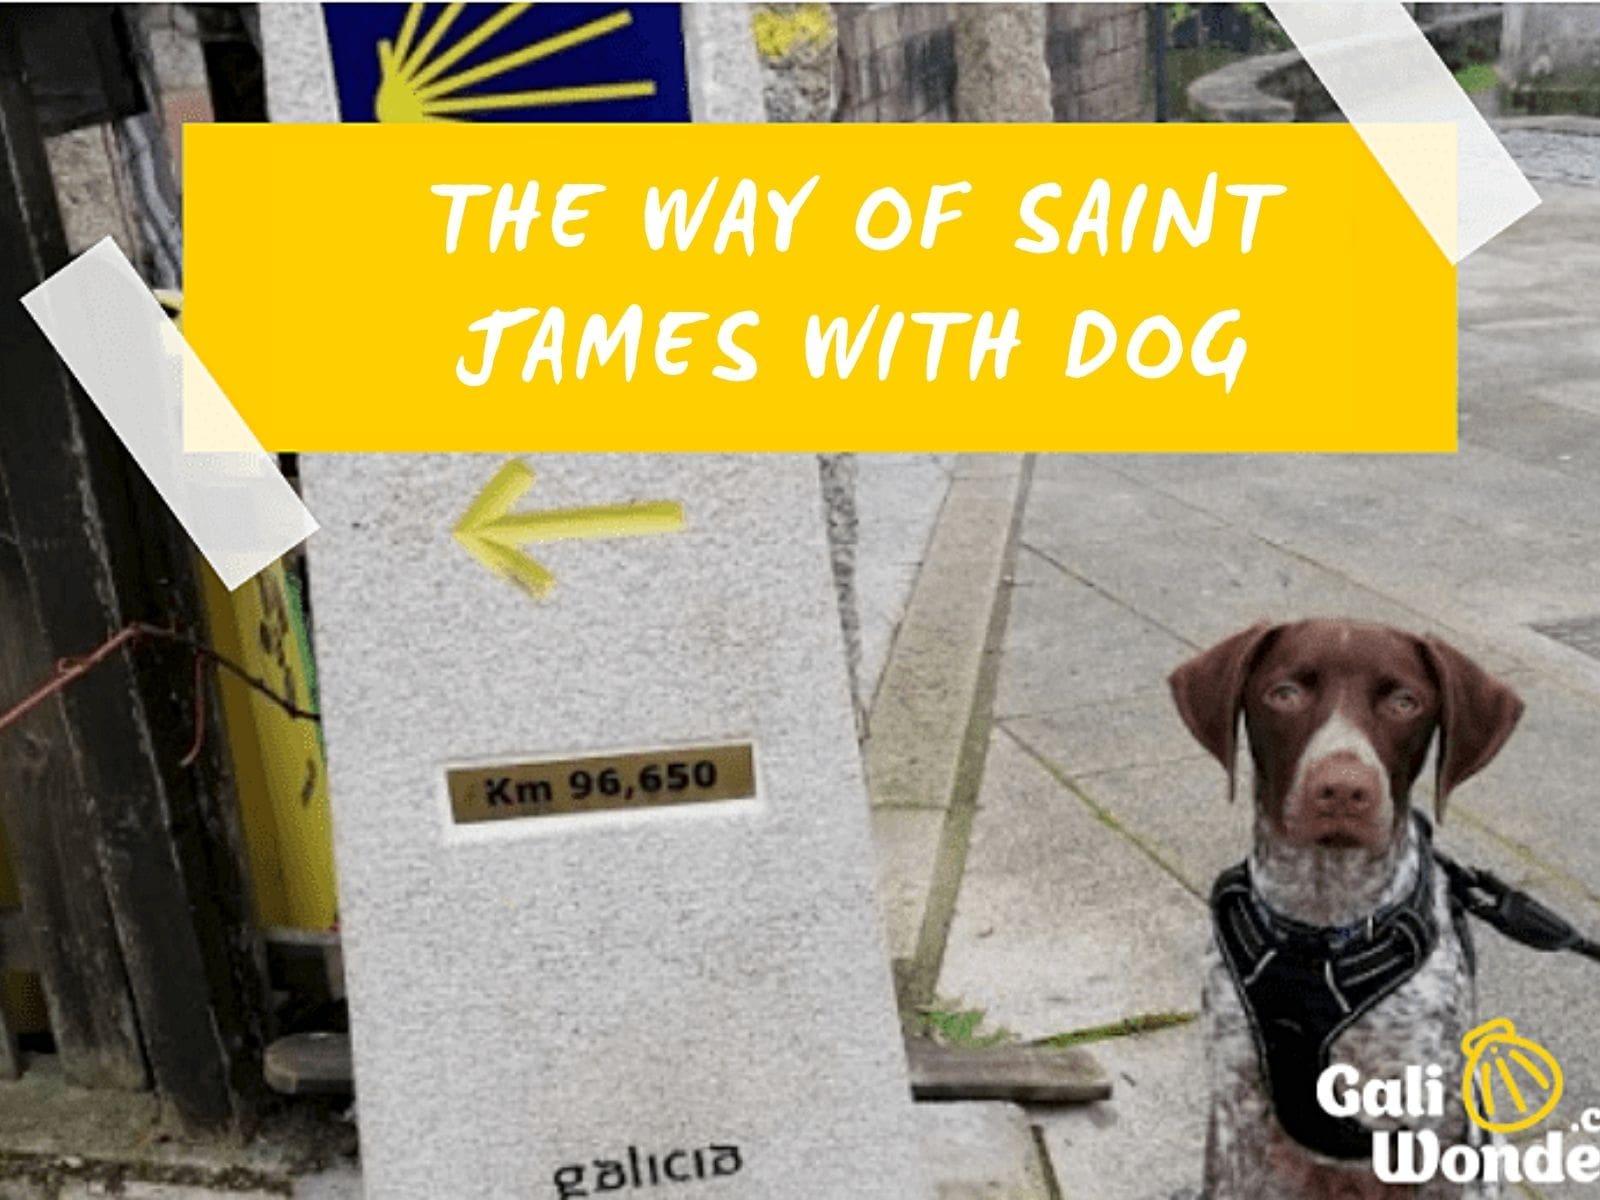 Walk the Camino de Santiago with a dog